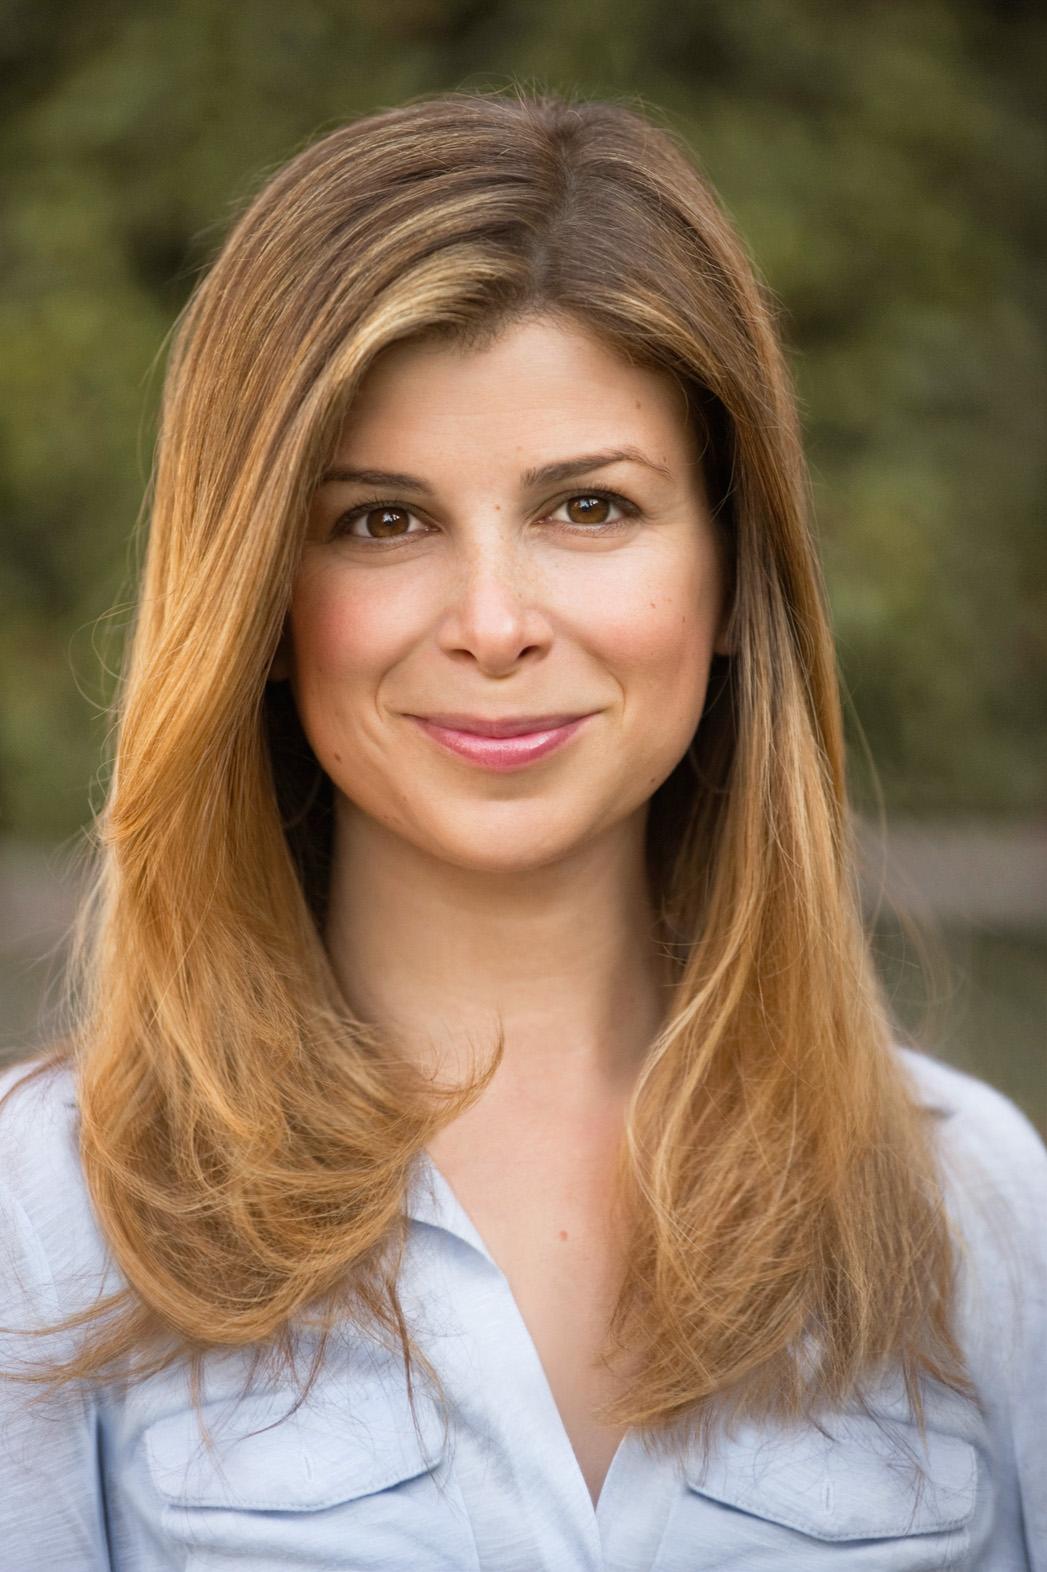 Laura Dave Author Headshot - P 2014